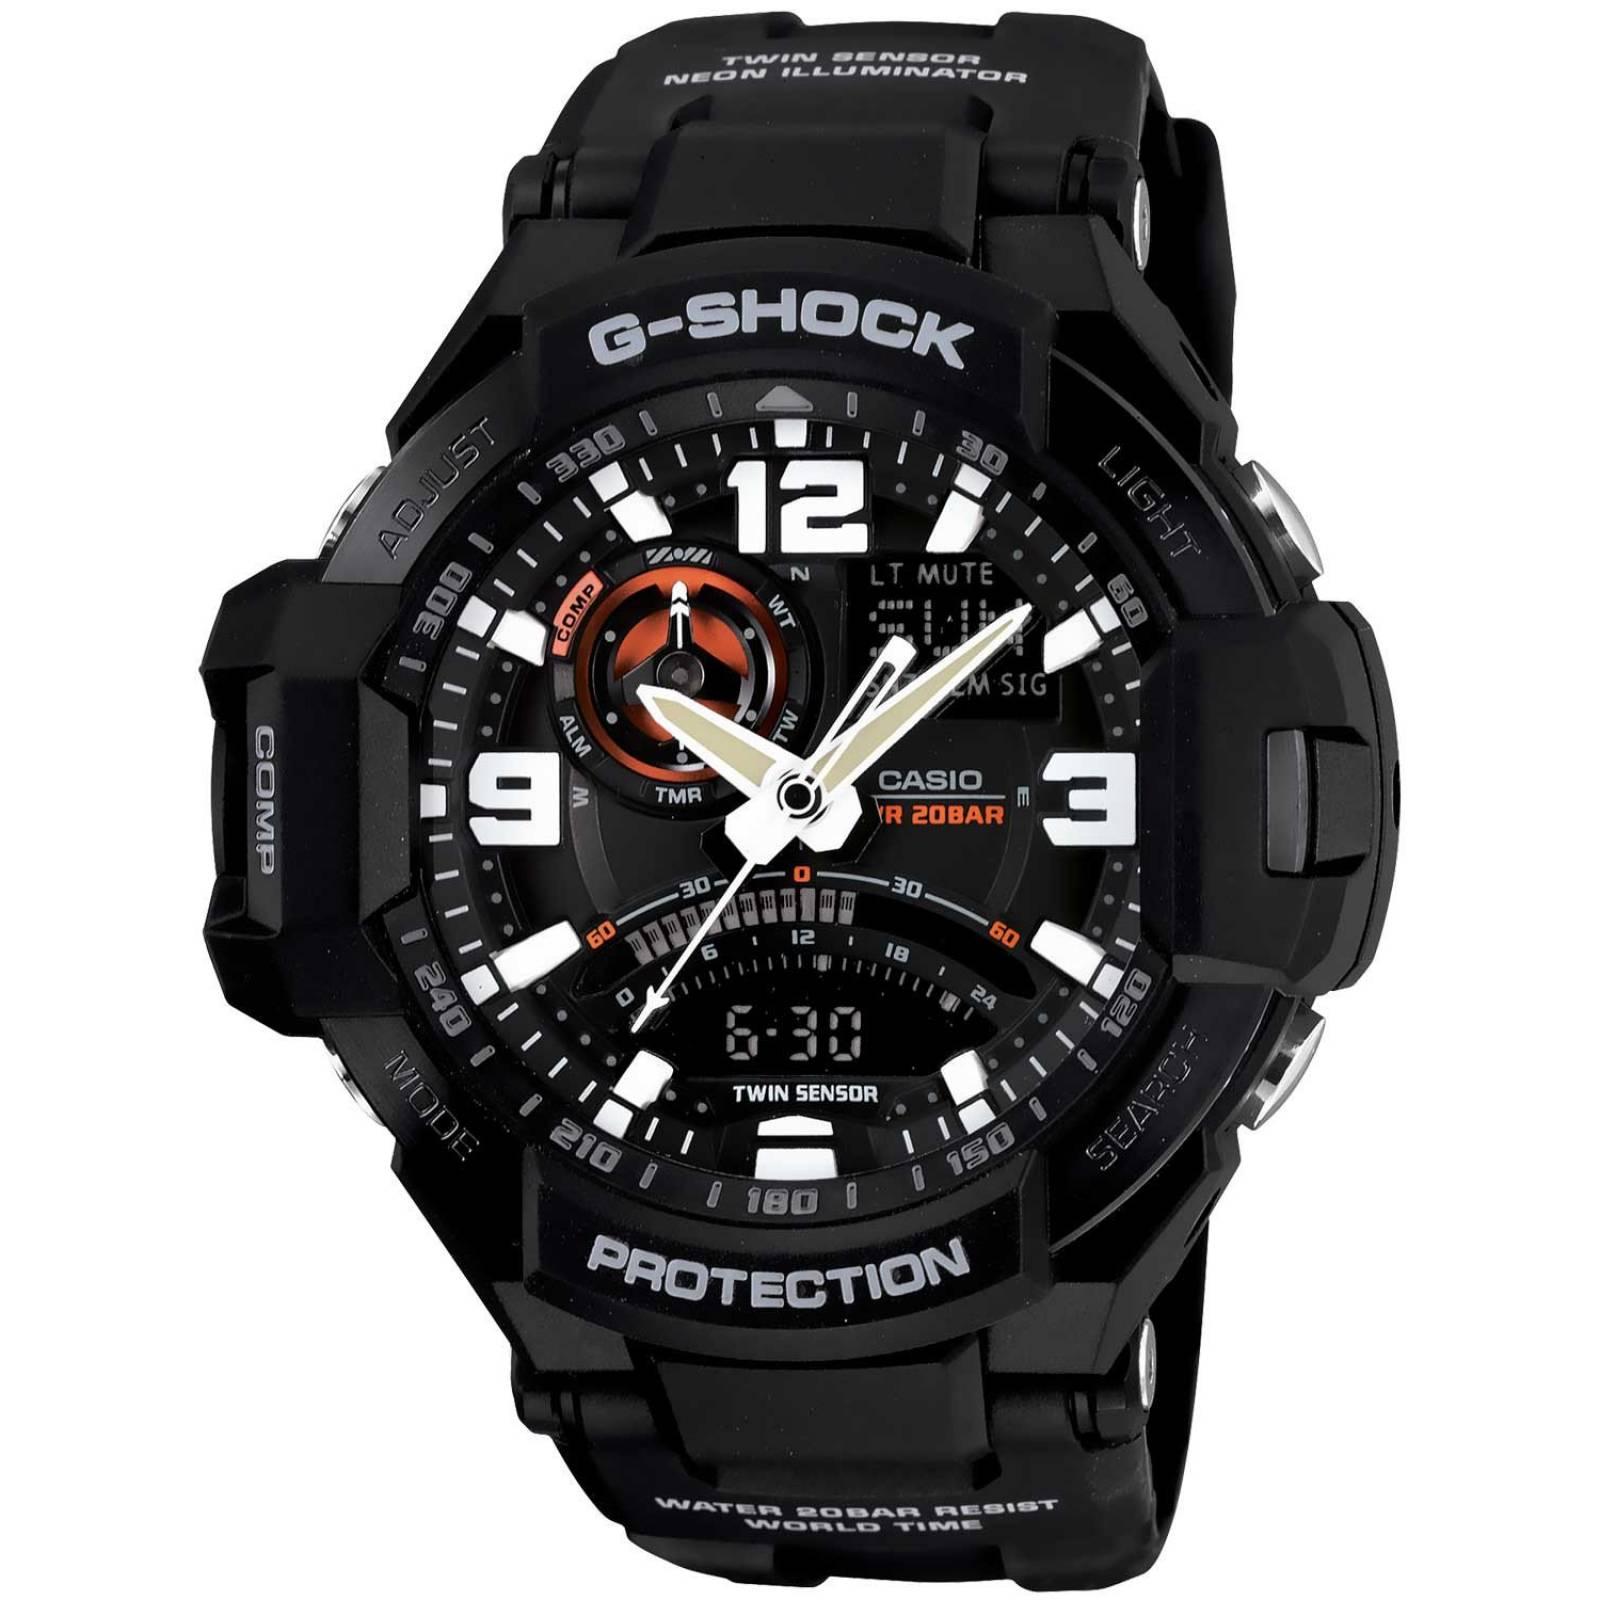 23a1c3efb01d Reloj casio g-shock gravity defier para caballero